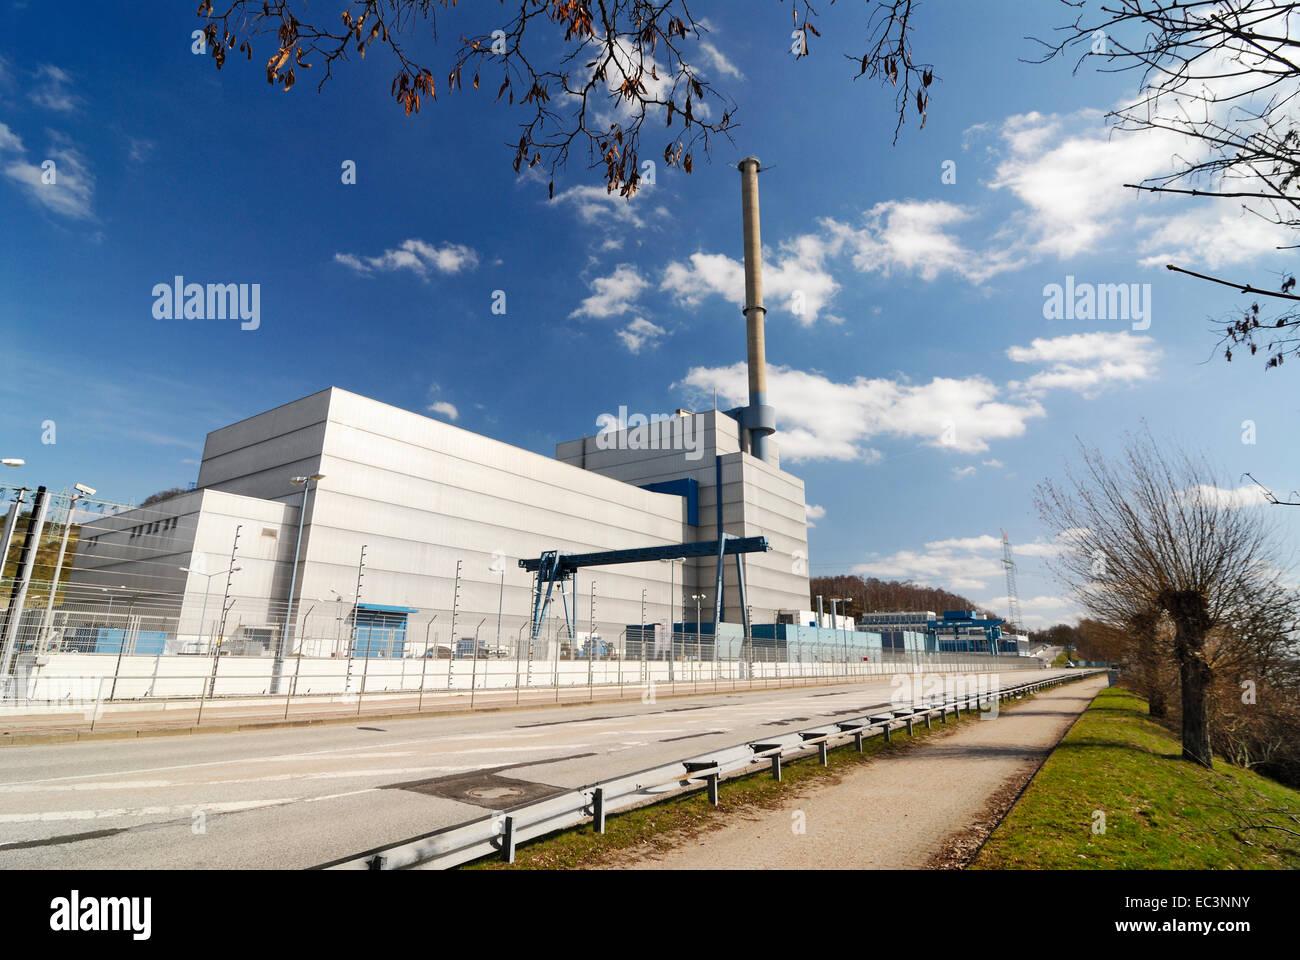 Atomic power plant Kruemmel near Hamburg, Germany - Stock Image